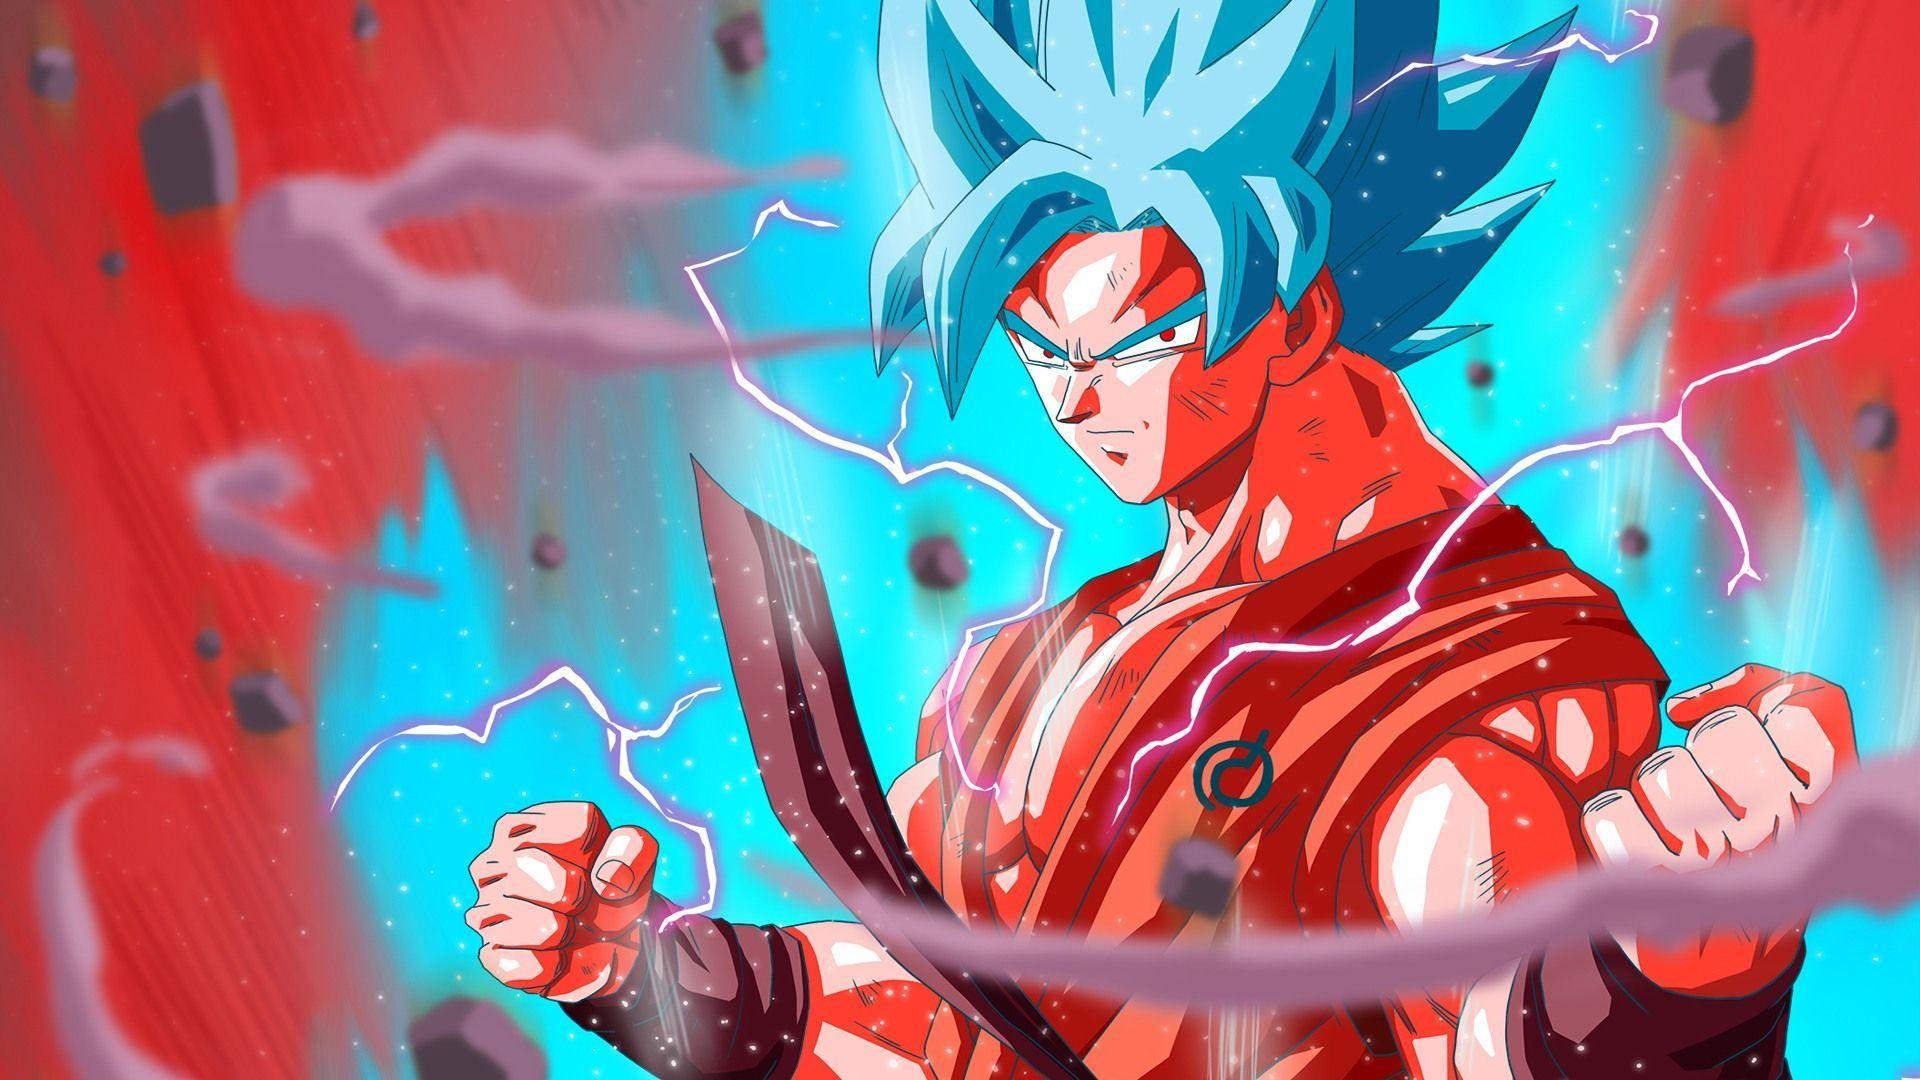 Goku Super Saiyan Blue DBS Wallpaper #6709